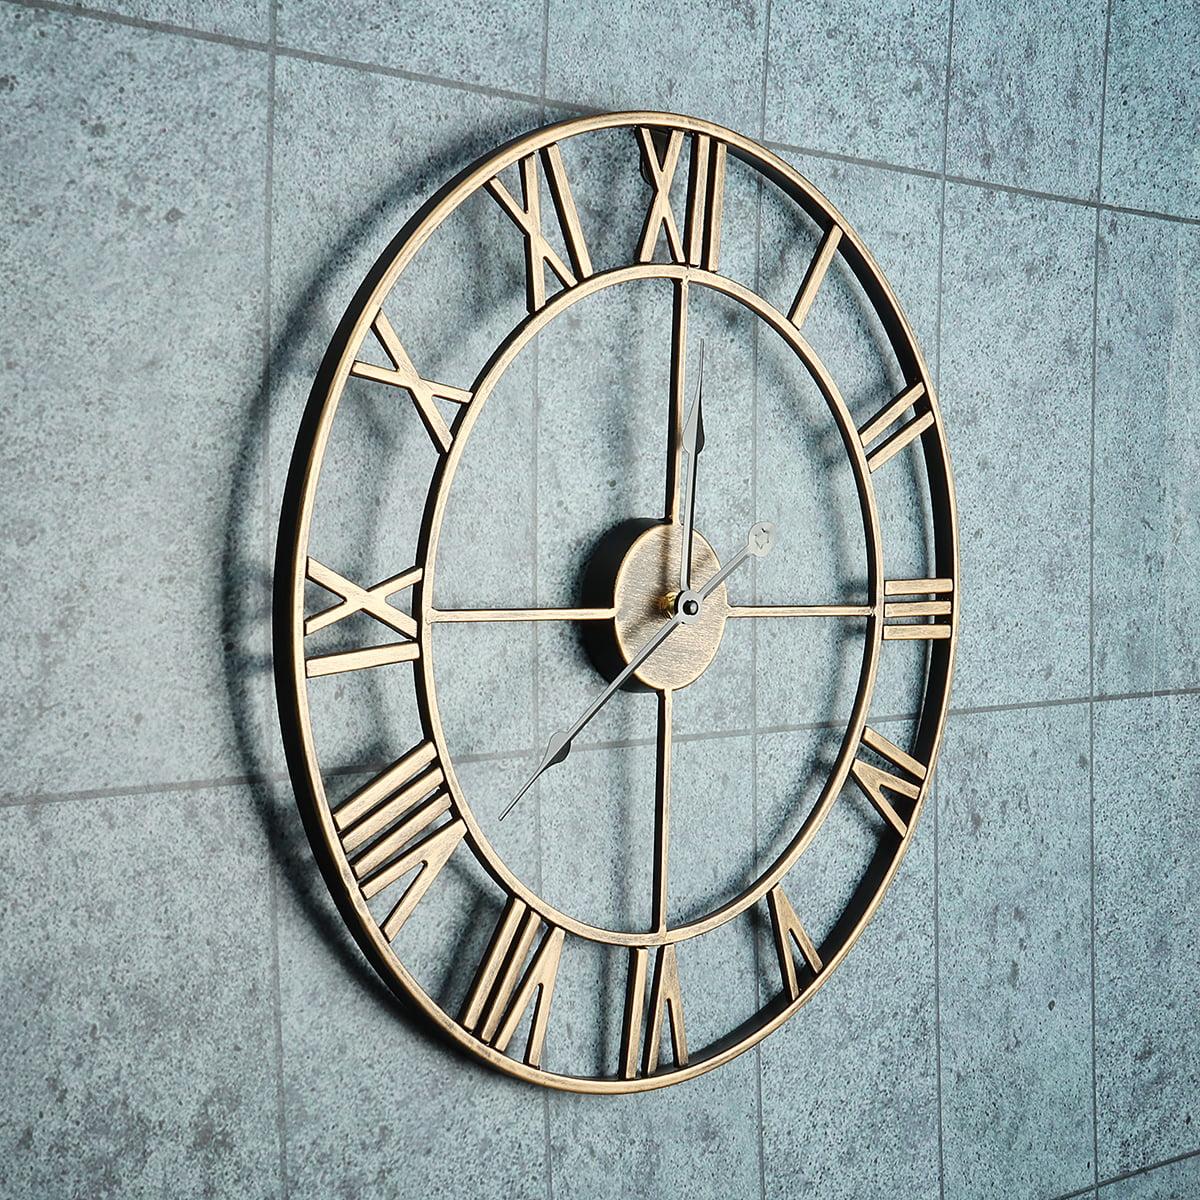 18 5 3d Large Big Wall Clock Non Ticking Luxury Vintage Rustic Retro Metal Wall Decor Decorative Clock Crystal Metal Silent Clock For Living Room Bedroom Office Walmart Com Walmart Com